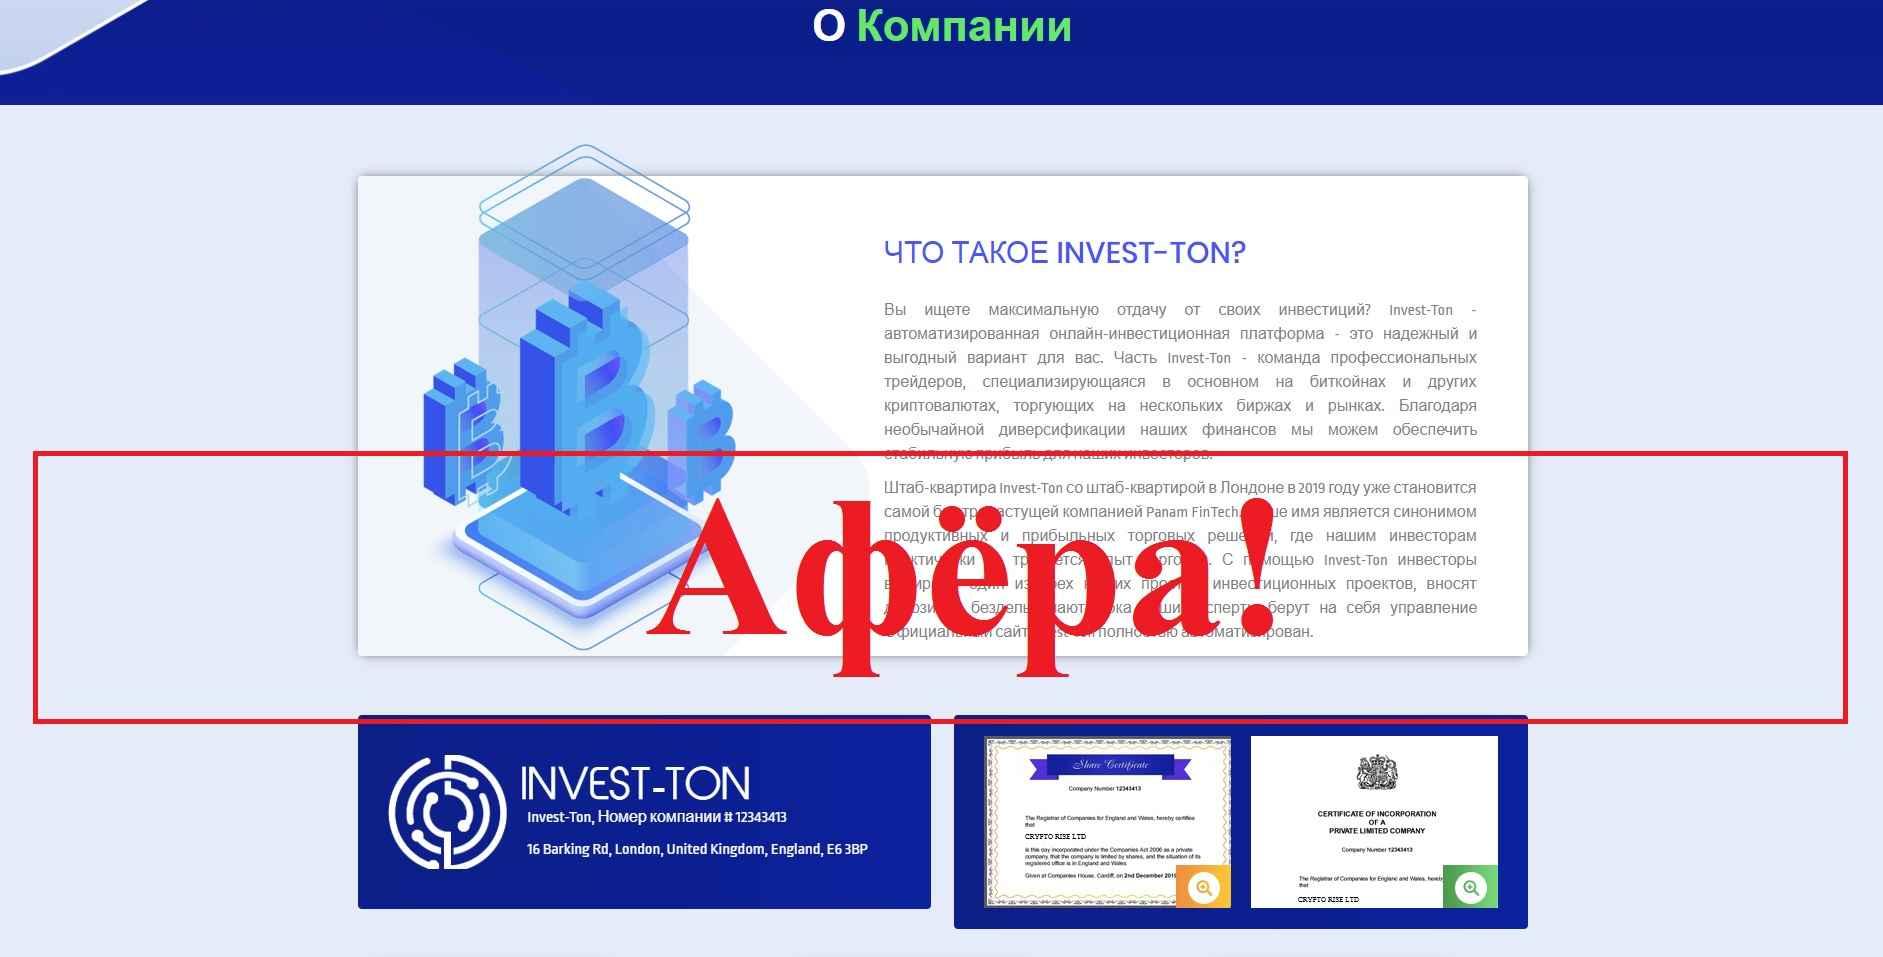 Invest-Ton – отзывы о мошеннике